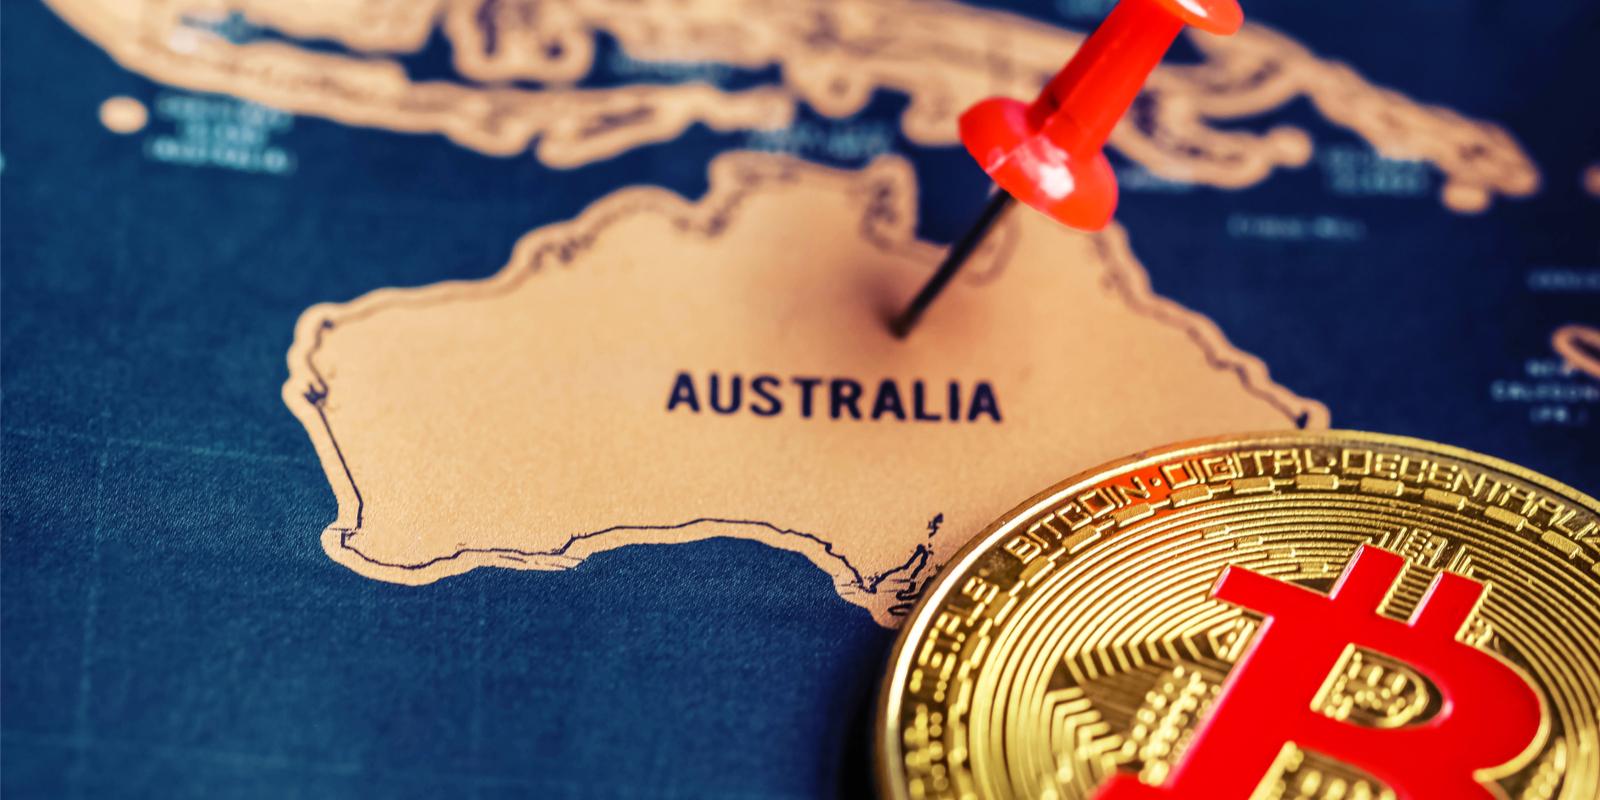 Kraken Acquires Australian Crypto Platform Bit Trade